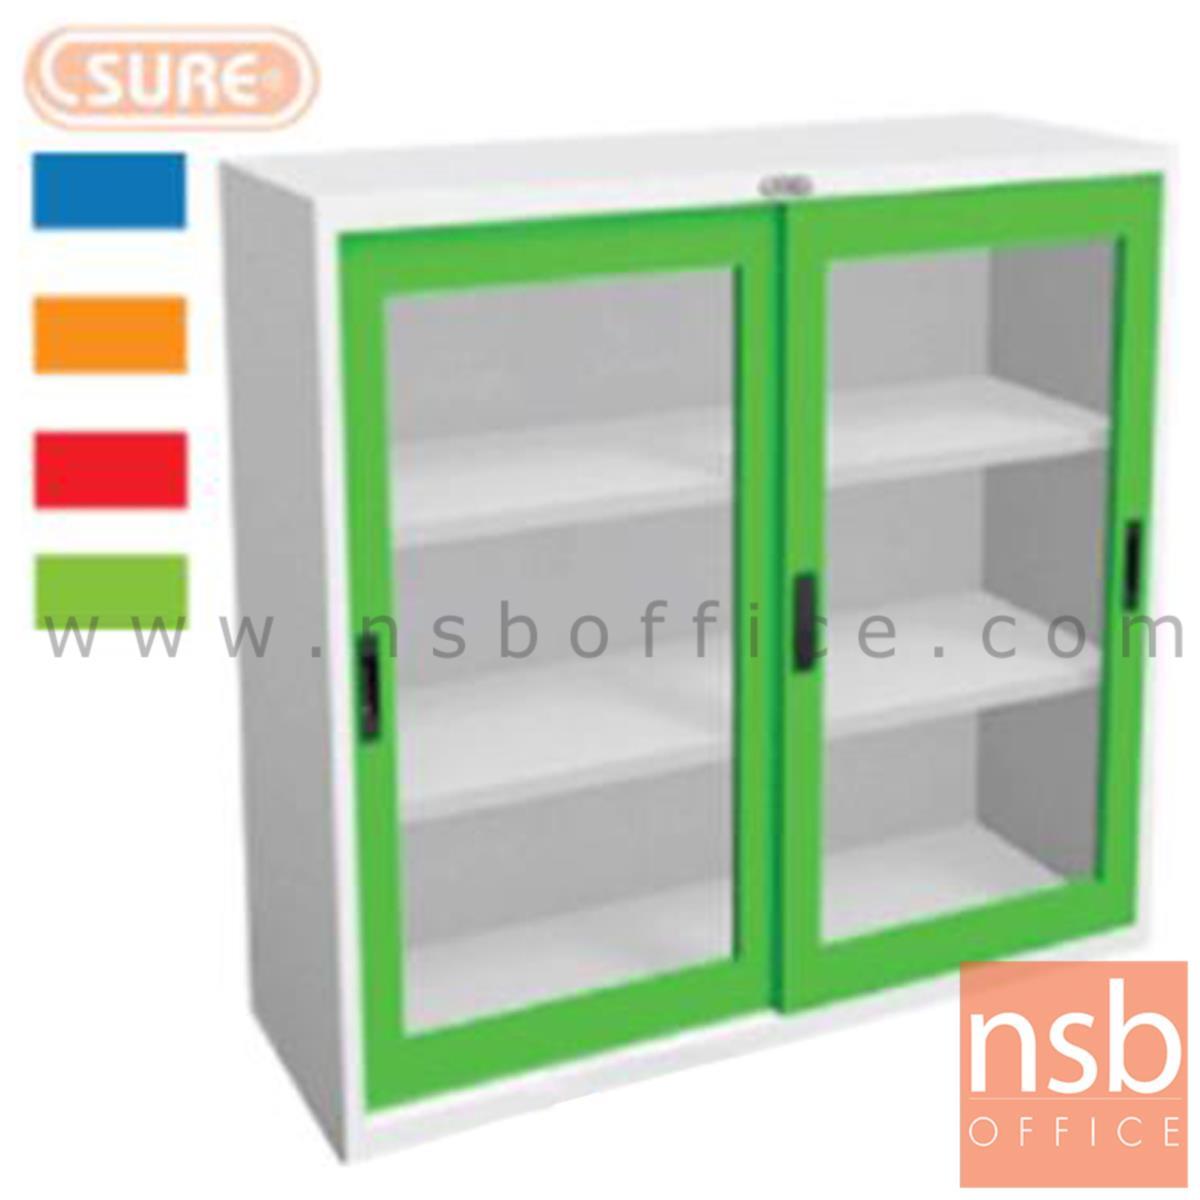 E04A039: ตู้เหล็ก 2 บานเลื่อนกระจกเตี้ย หน้าบานสีสัน (3 และ 4 ฟุต) รุ่น CSLG-03,CSLG-04